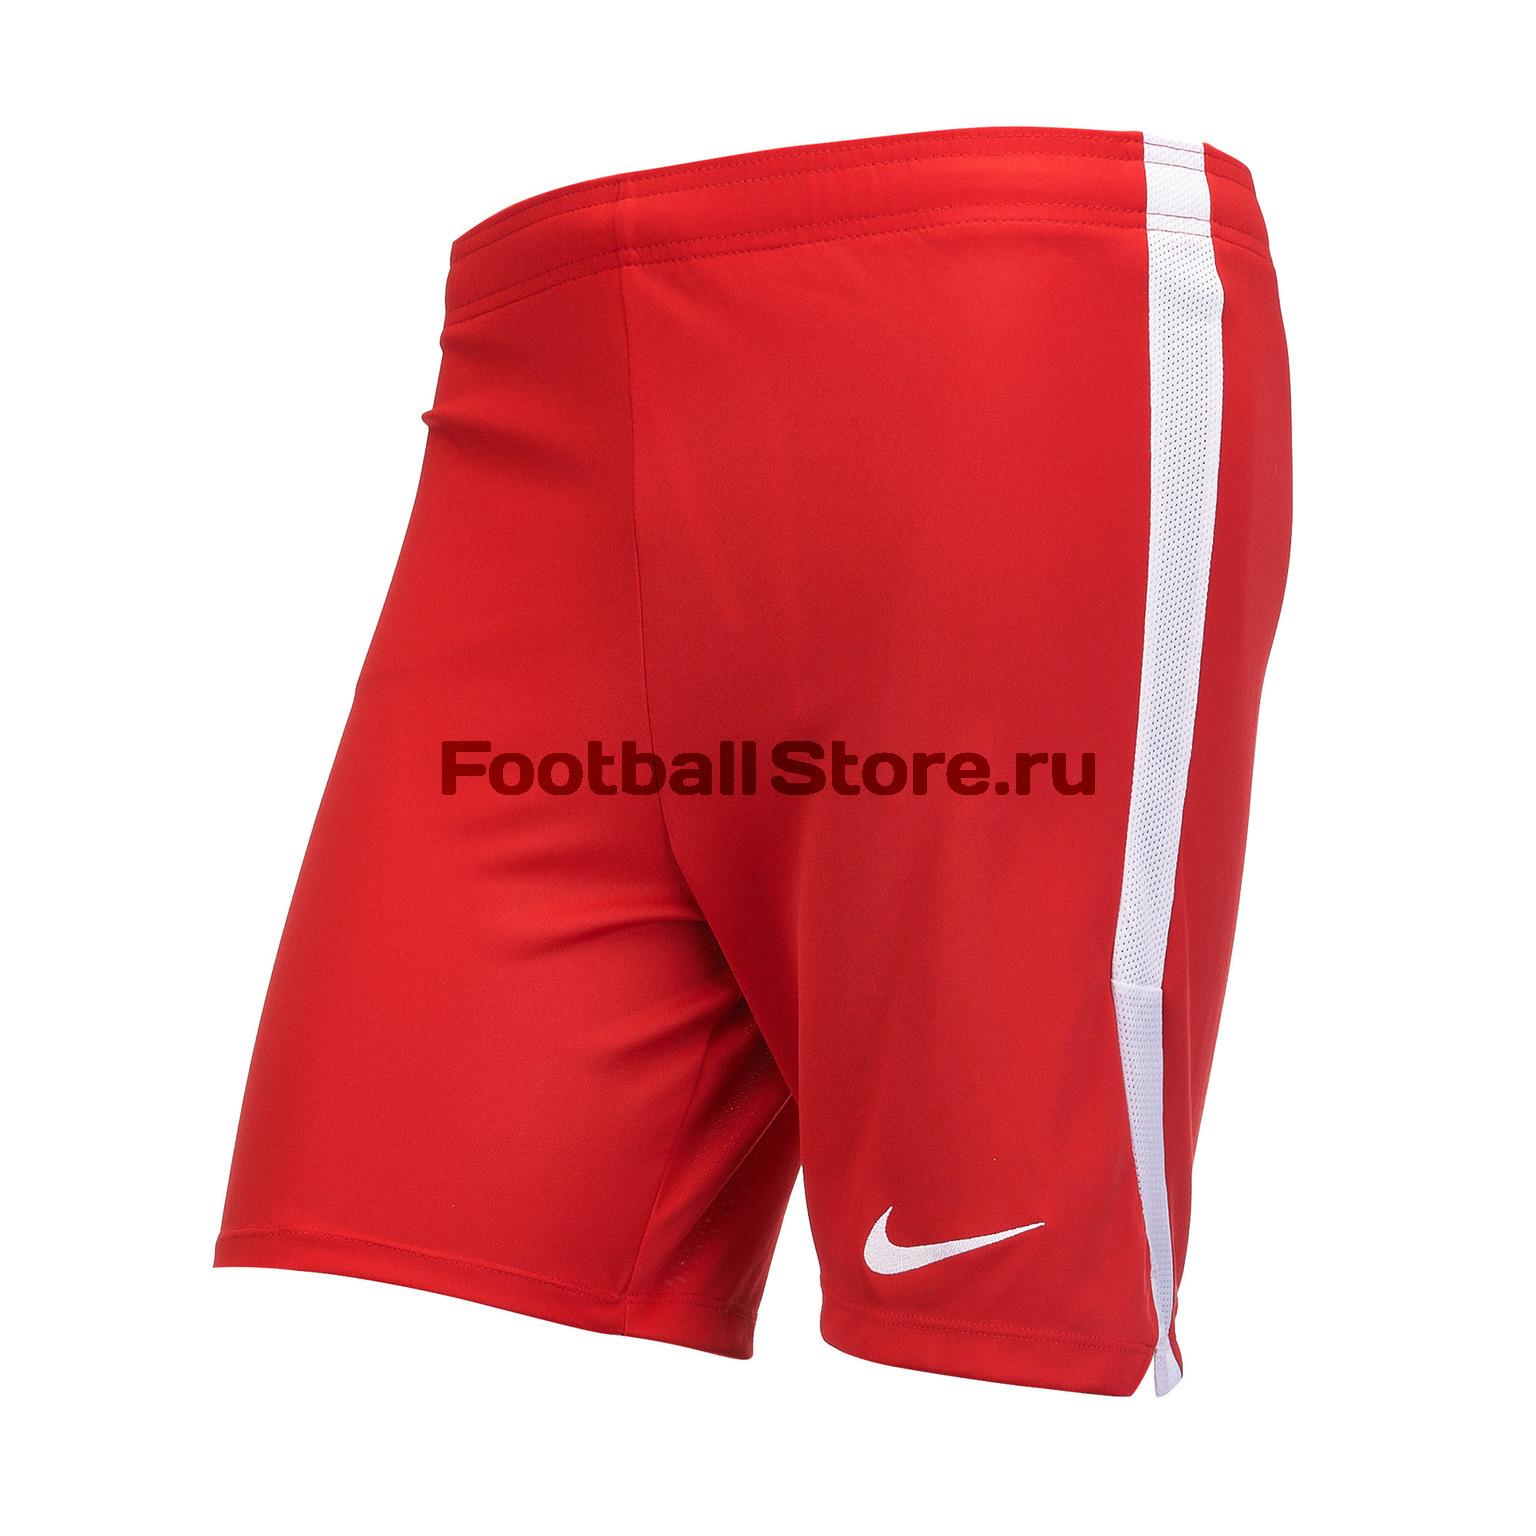 25dd42ff Шорты Nike Dry Classic AJ1235-657 – купить в интернет магазине ...